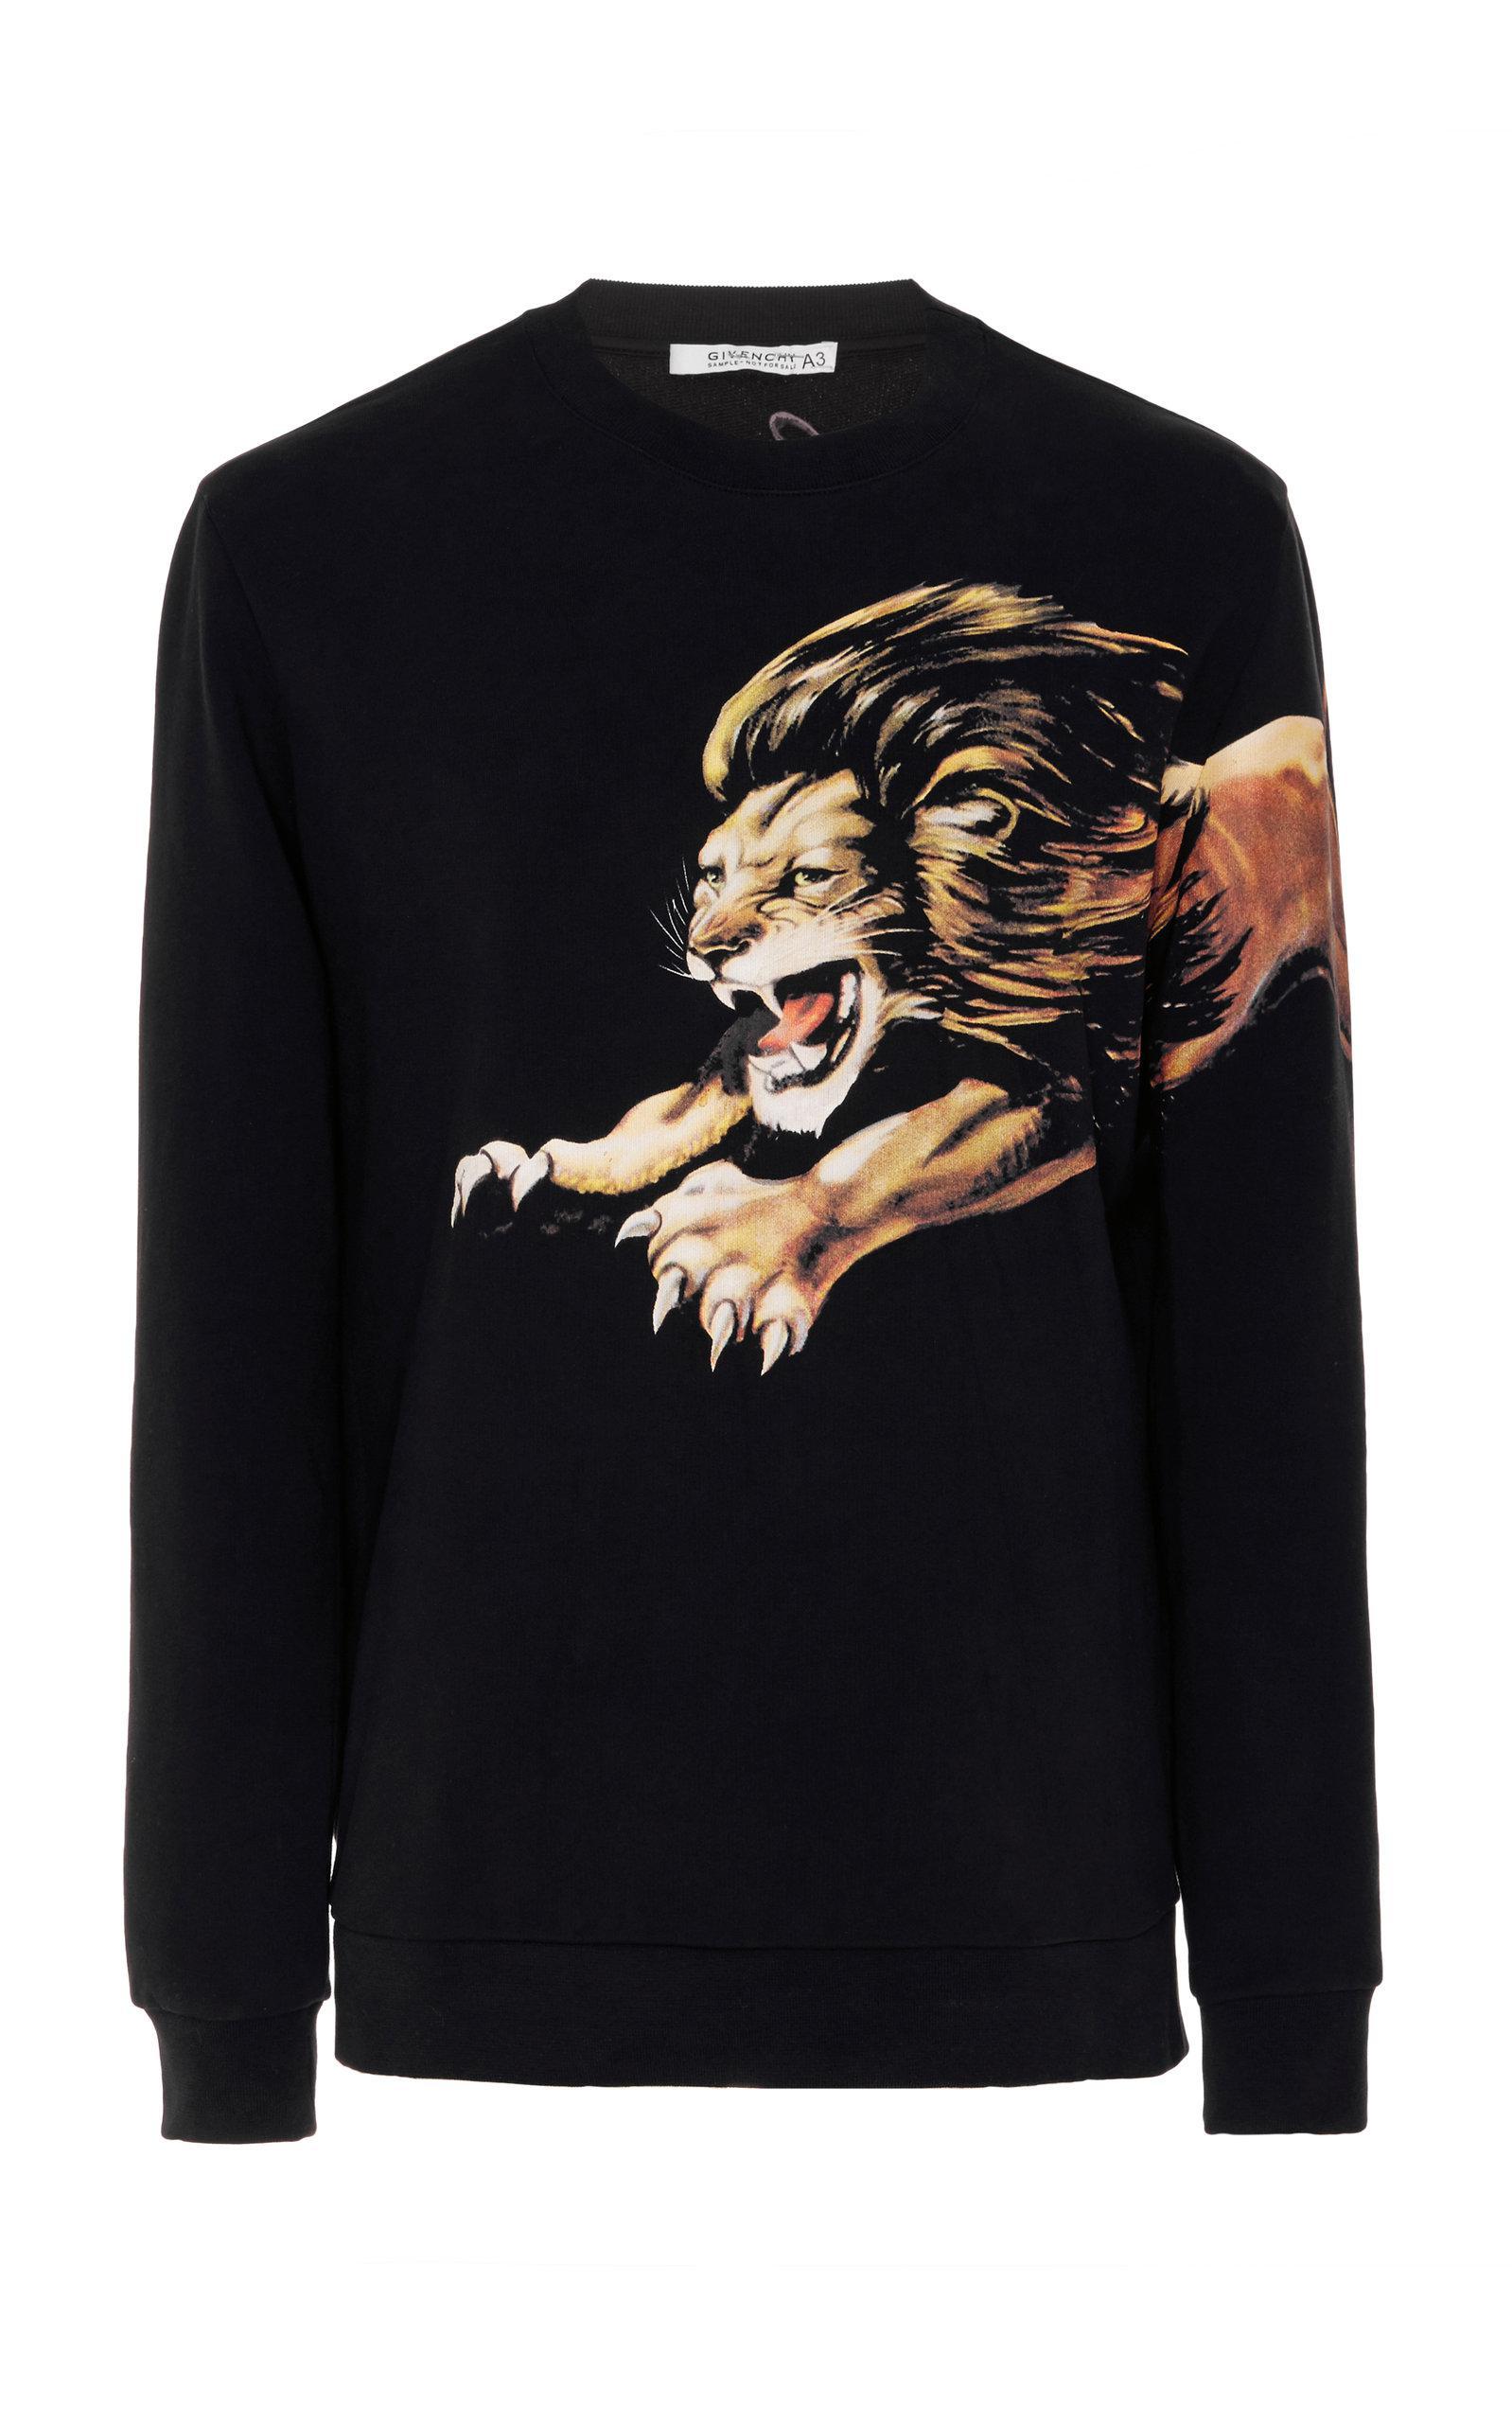 Lion Lion Givenchy print print Givenchy Sweatshirt Lion Sweatshirt Lion print Givenchy Givenchy print Sweatshirt Lion Sweatshirt rCAqwr4